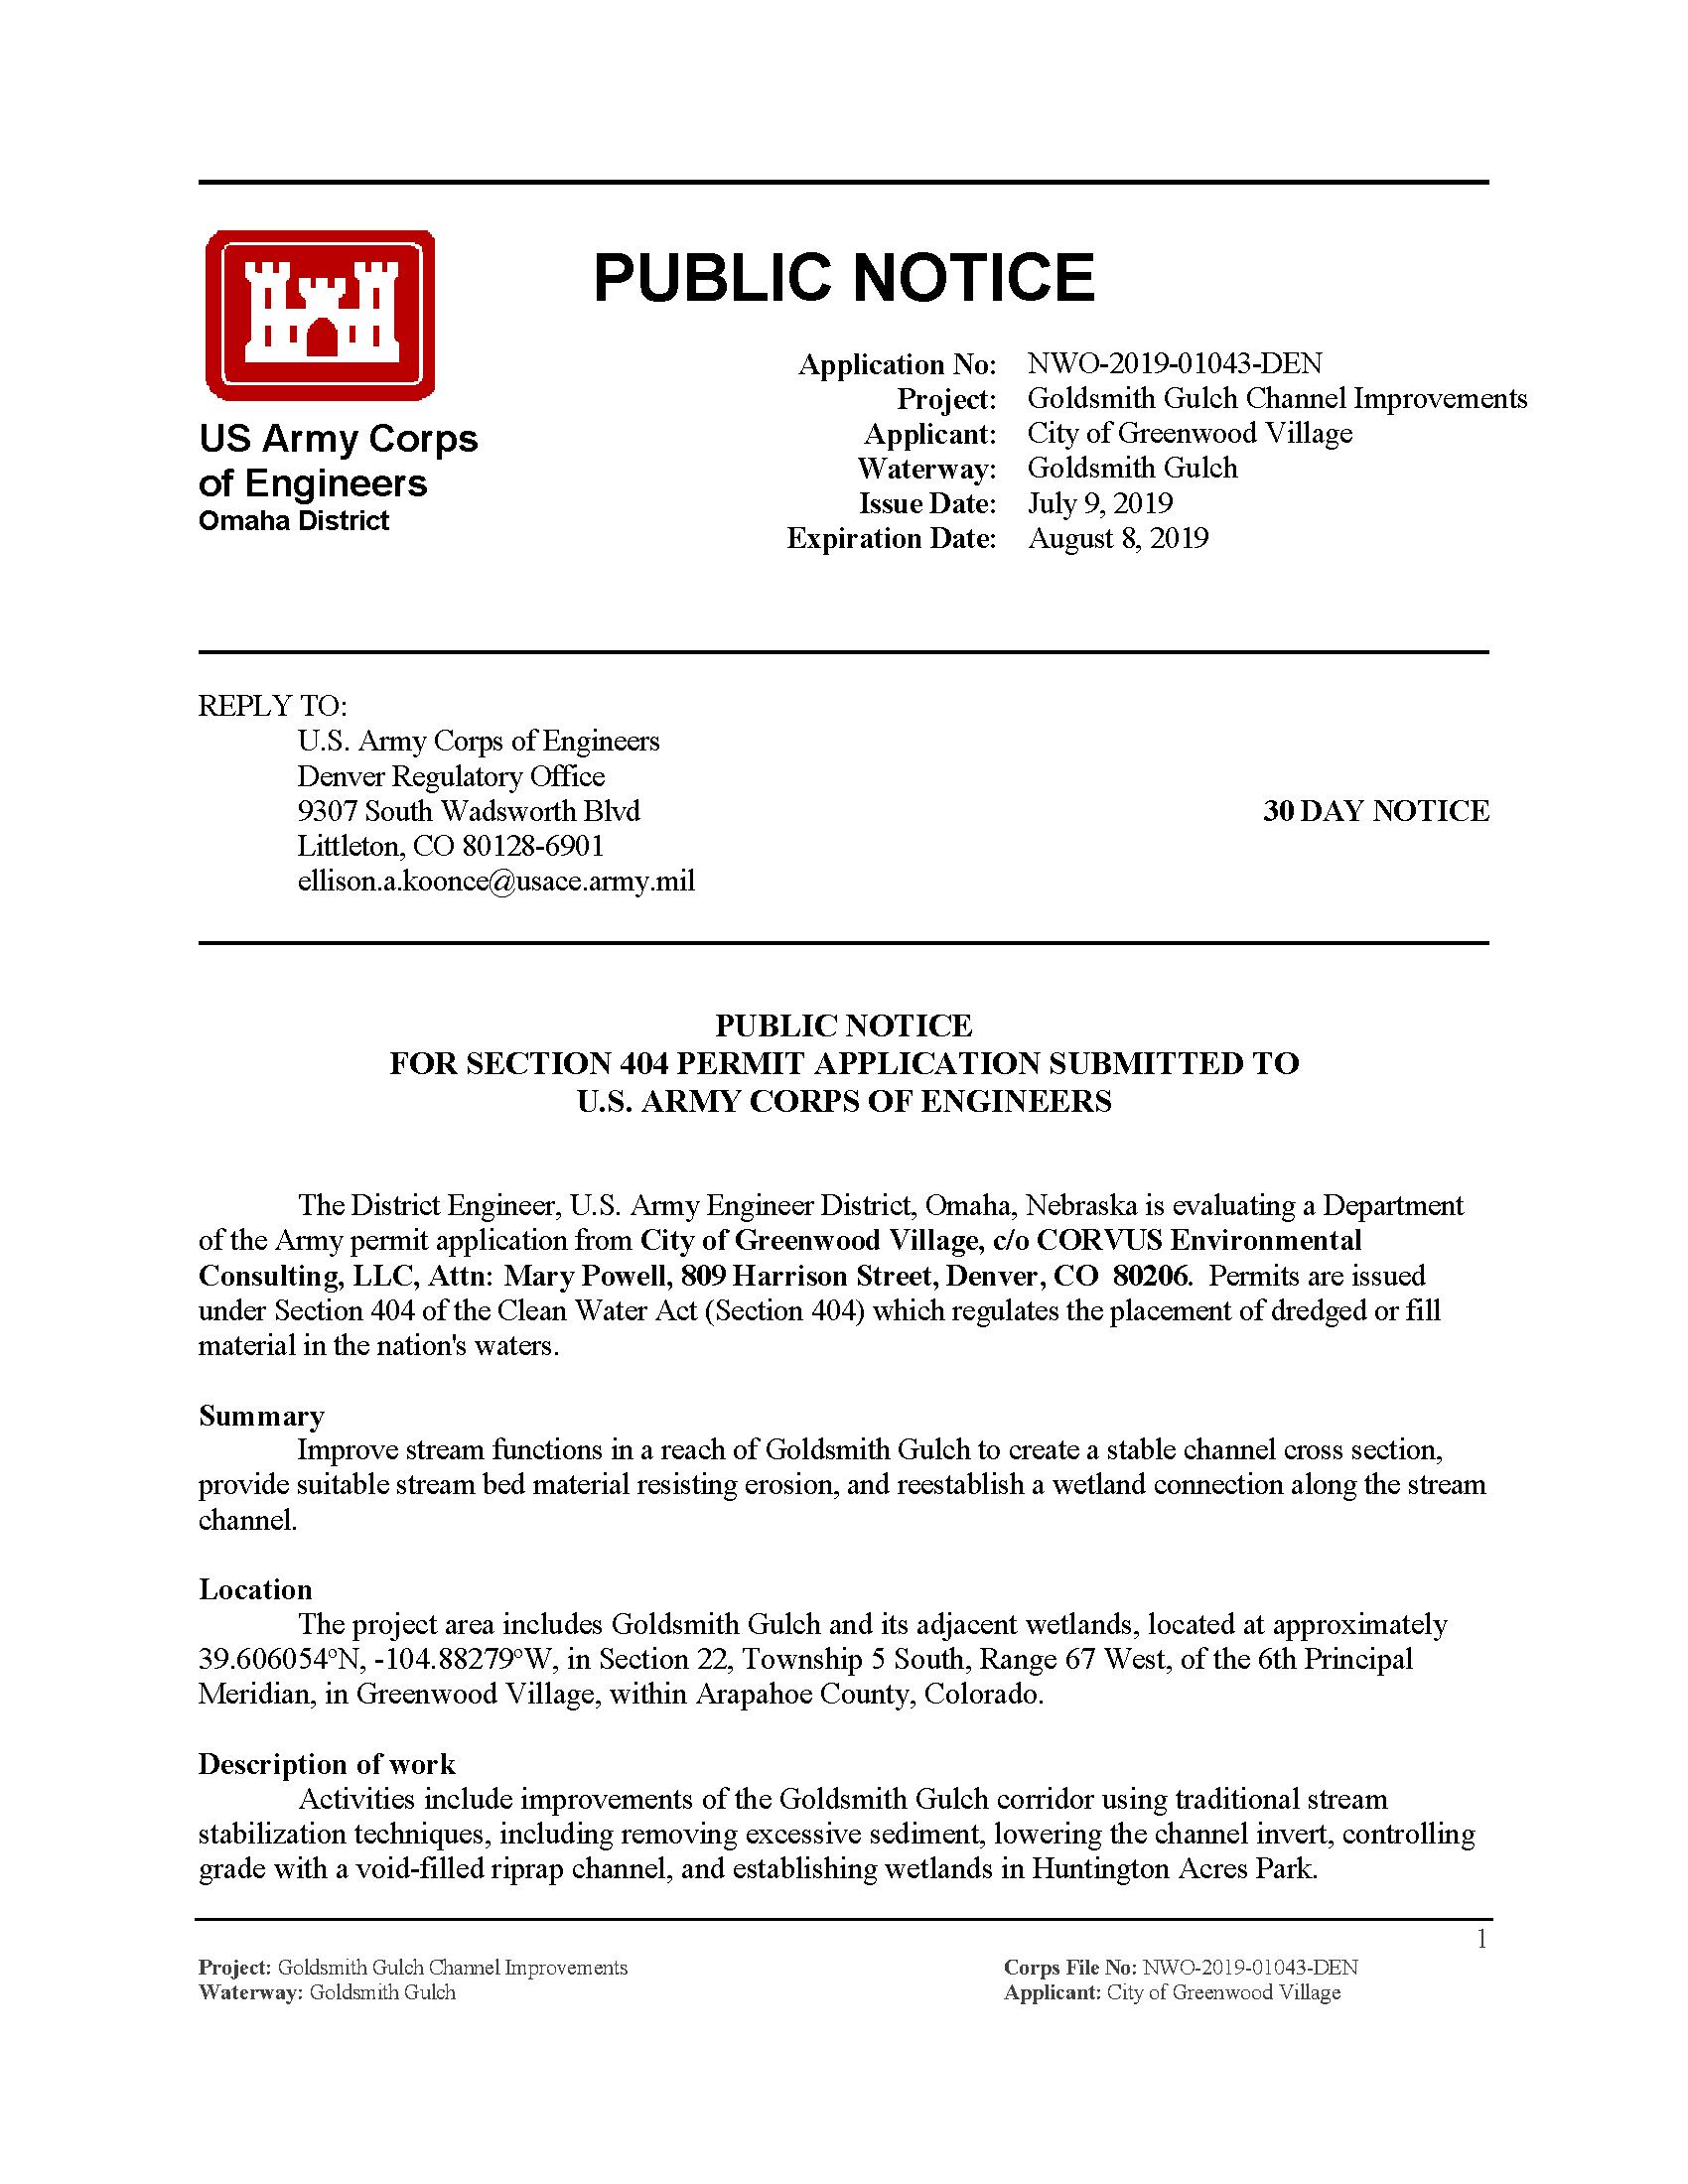 Public notice: Application no: NWO-2019-01043-DEN - Project